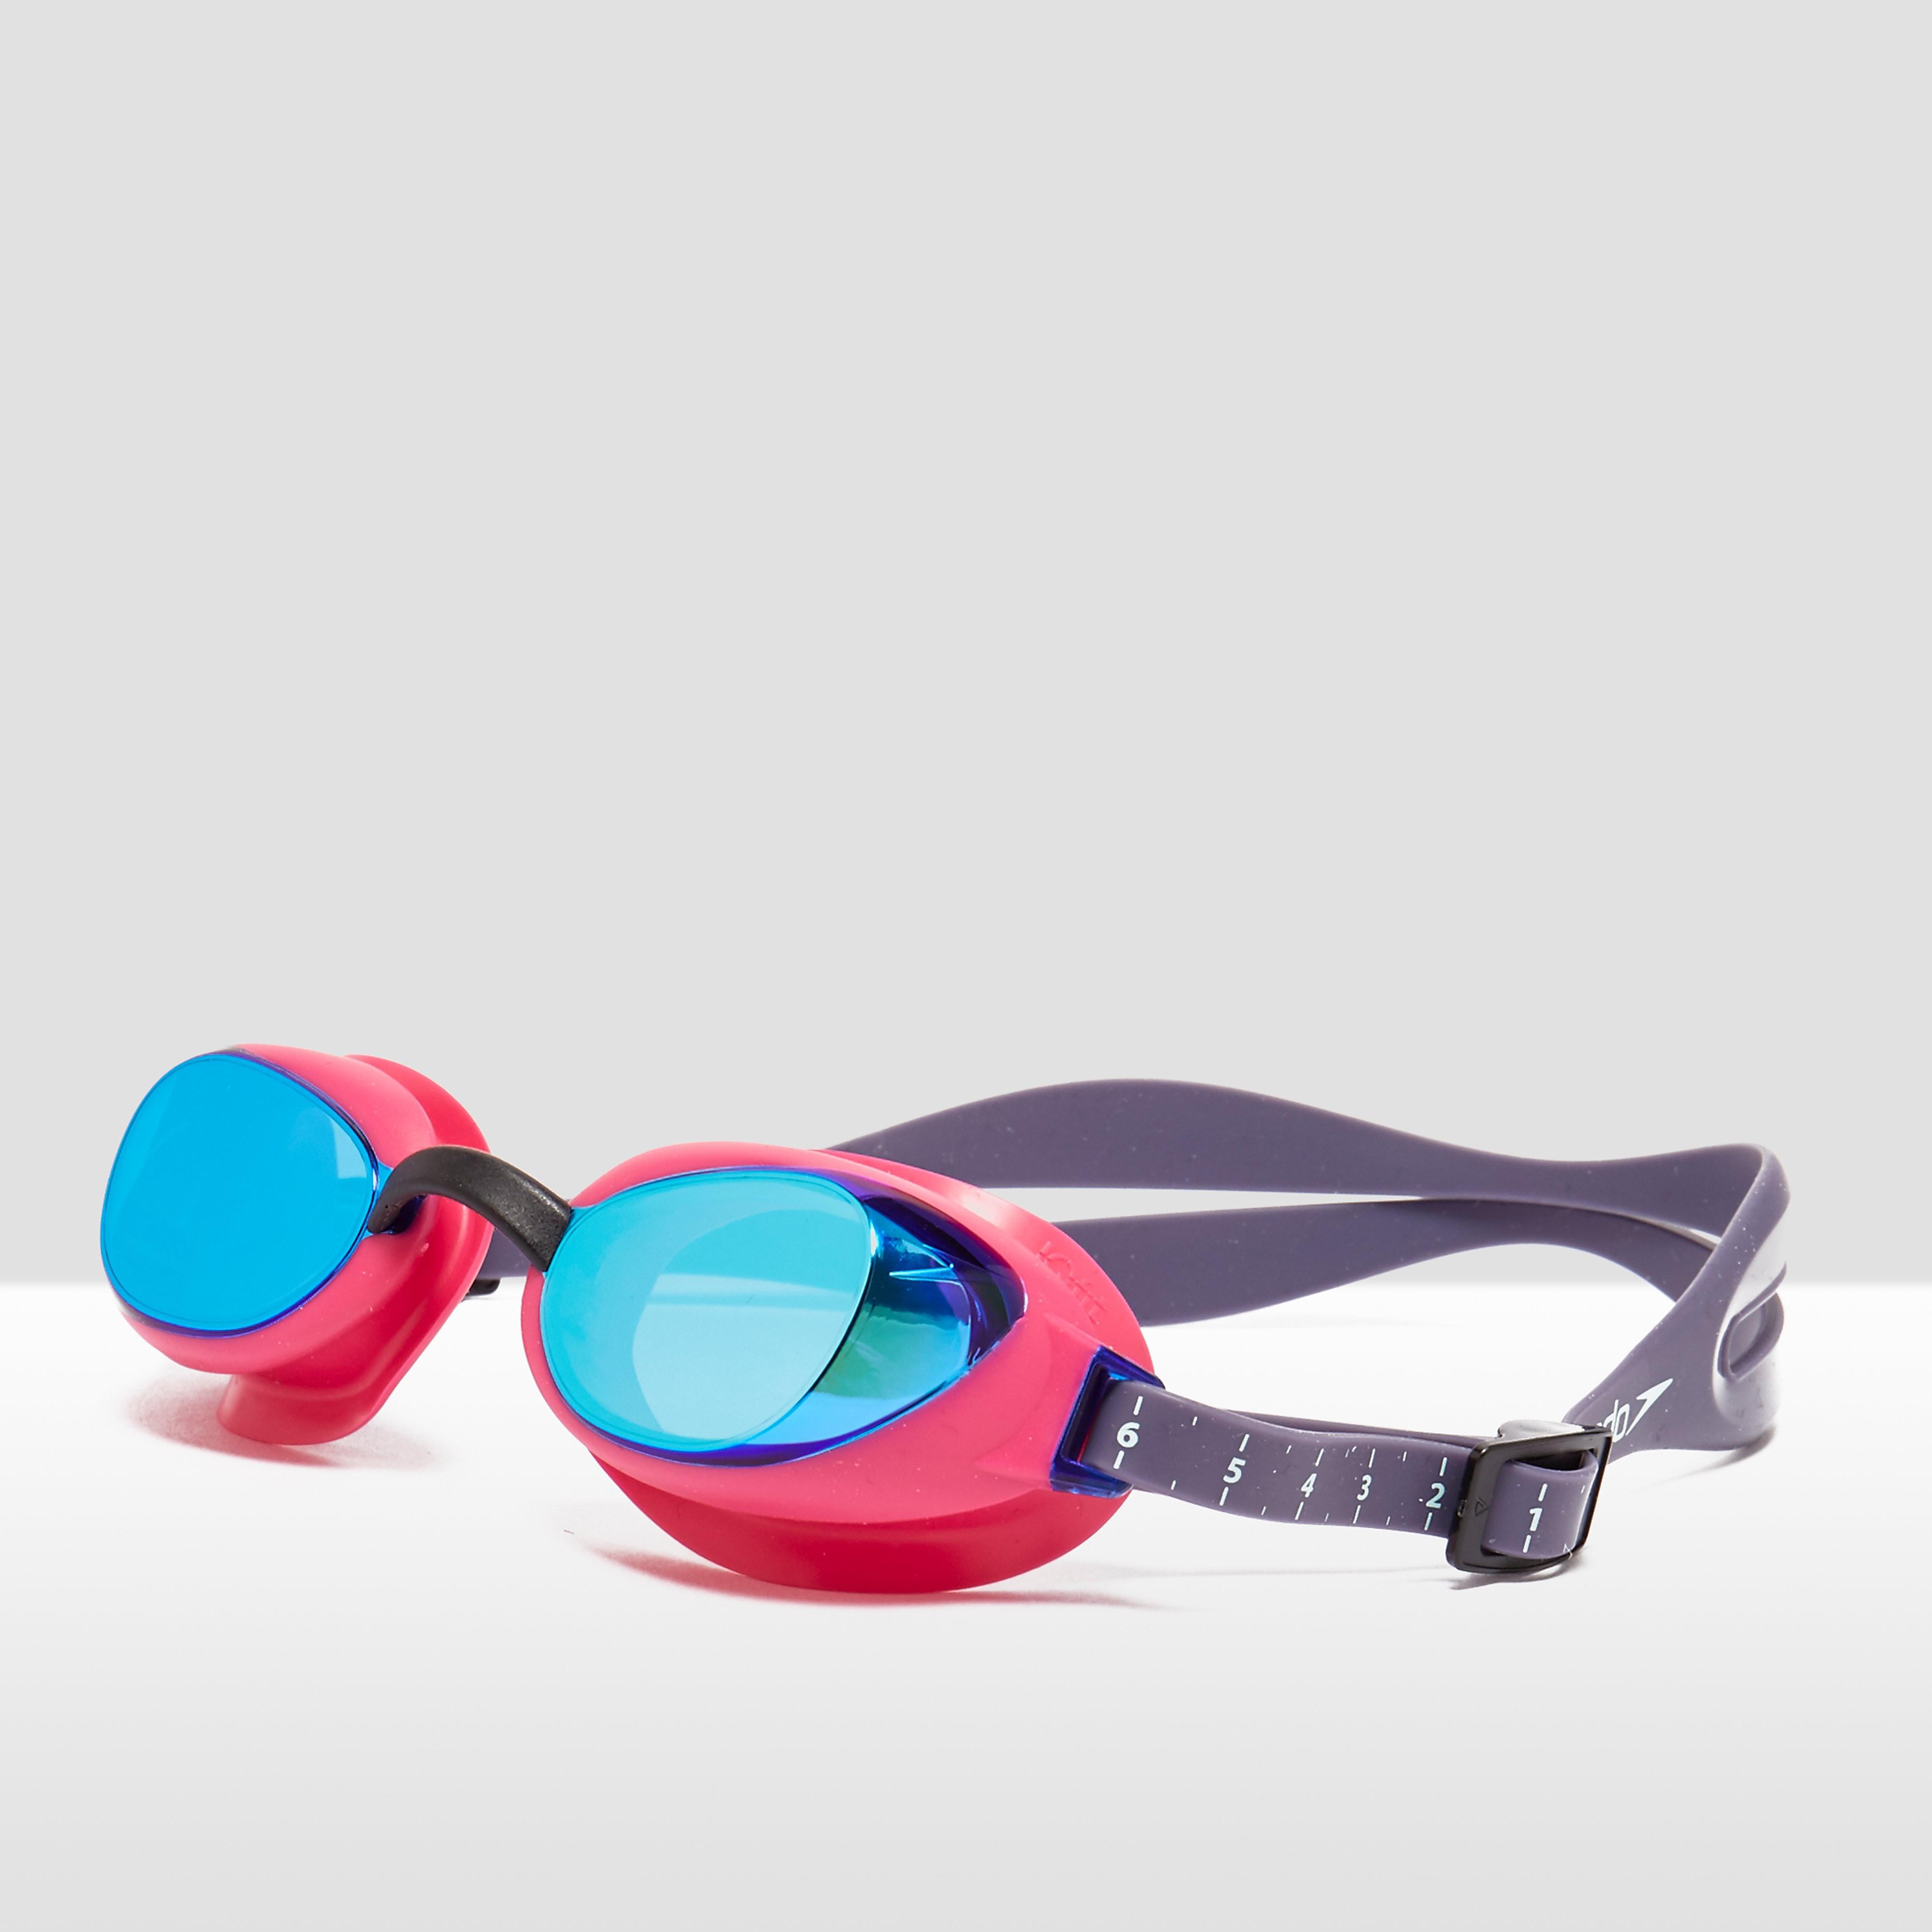 Speedo Women's Aquapure Mirror Goggles